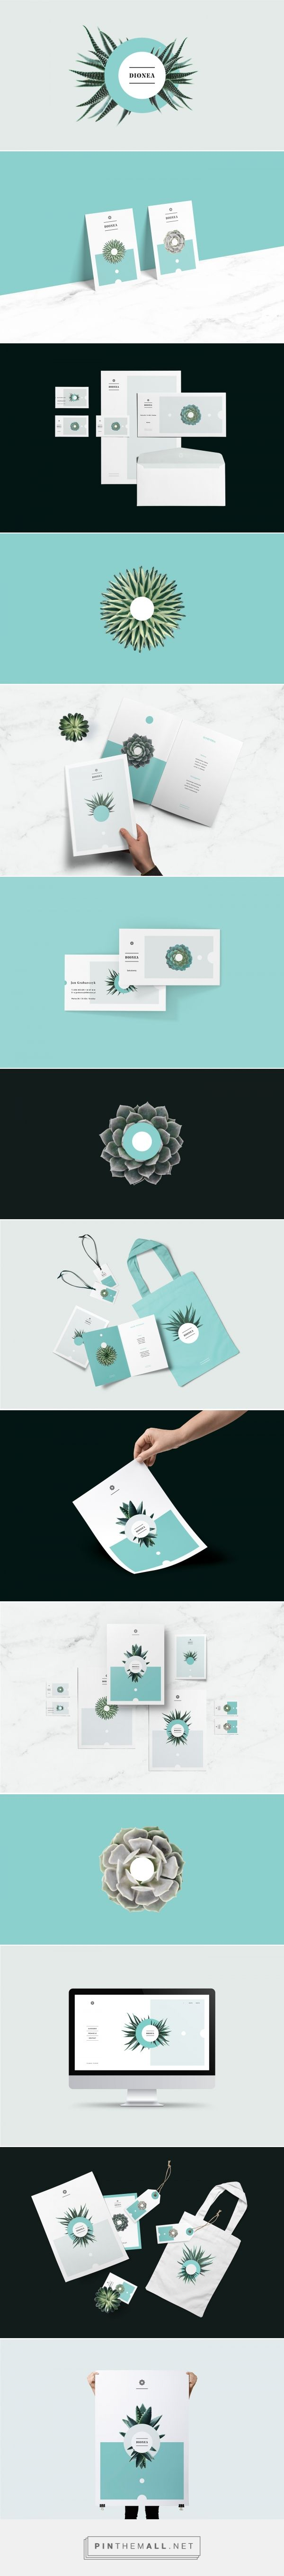 Dionea Branding by Przemek Bizori | Fivestar Branding Agency – Design and Branding Agency & Curated Inspiration Gallery